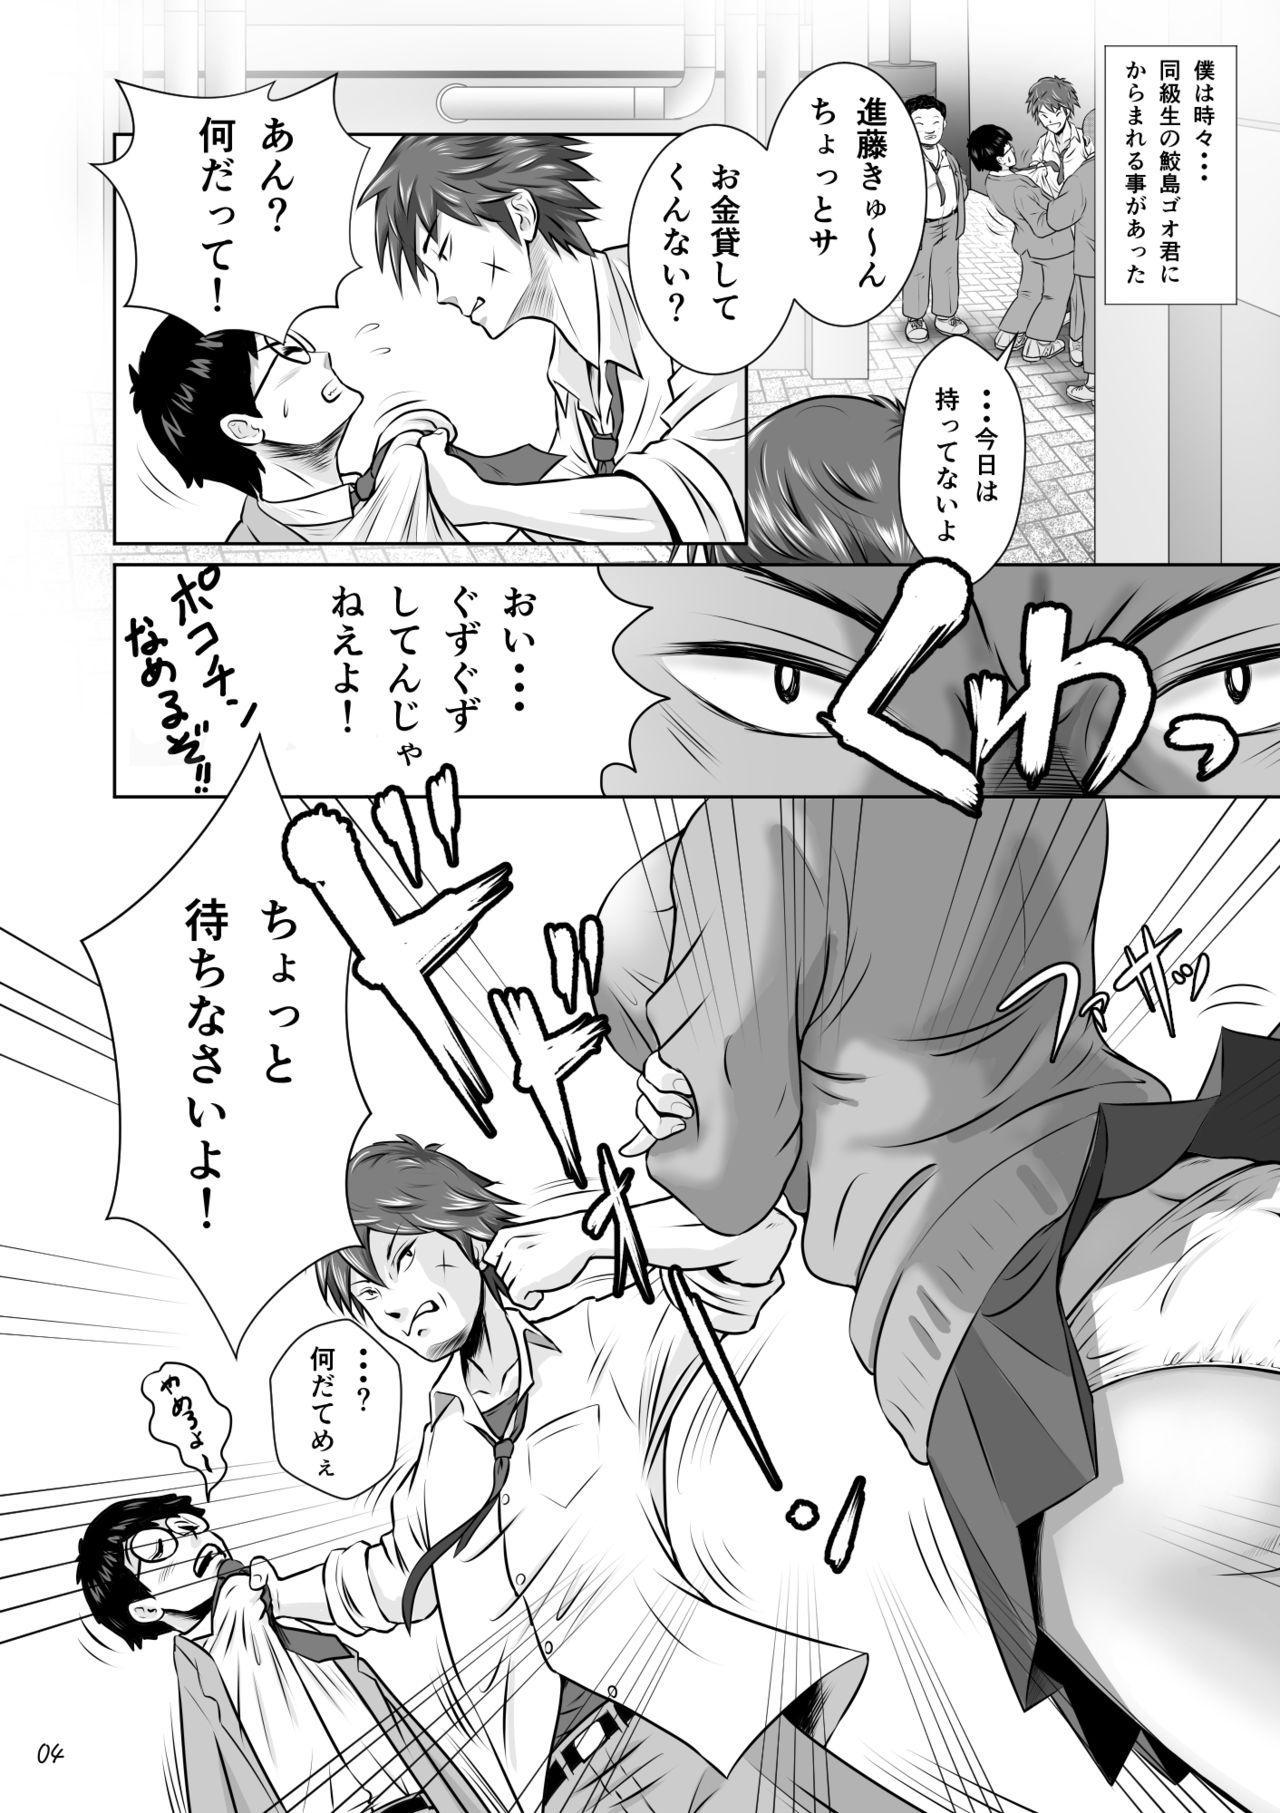 Netorare Osananajimi Haruka-chan Kiki Ippatsu!! 4